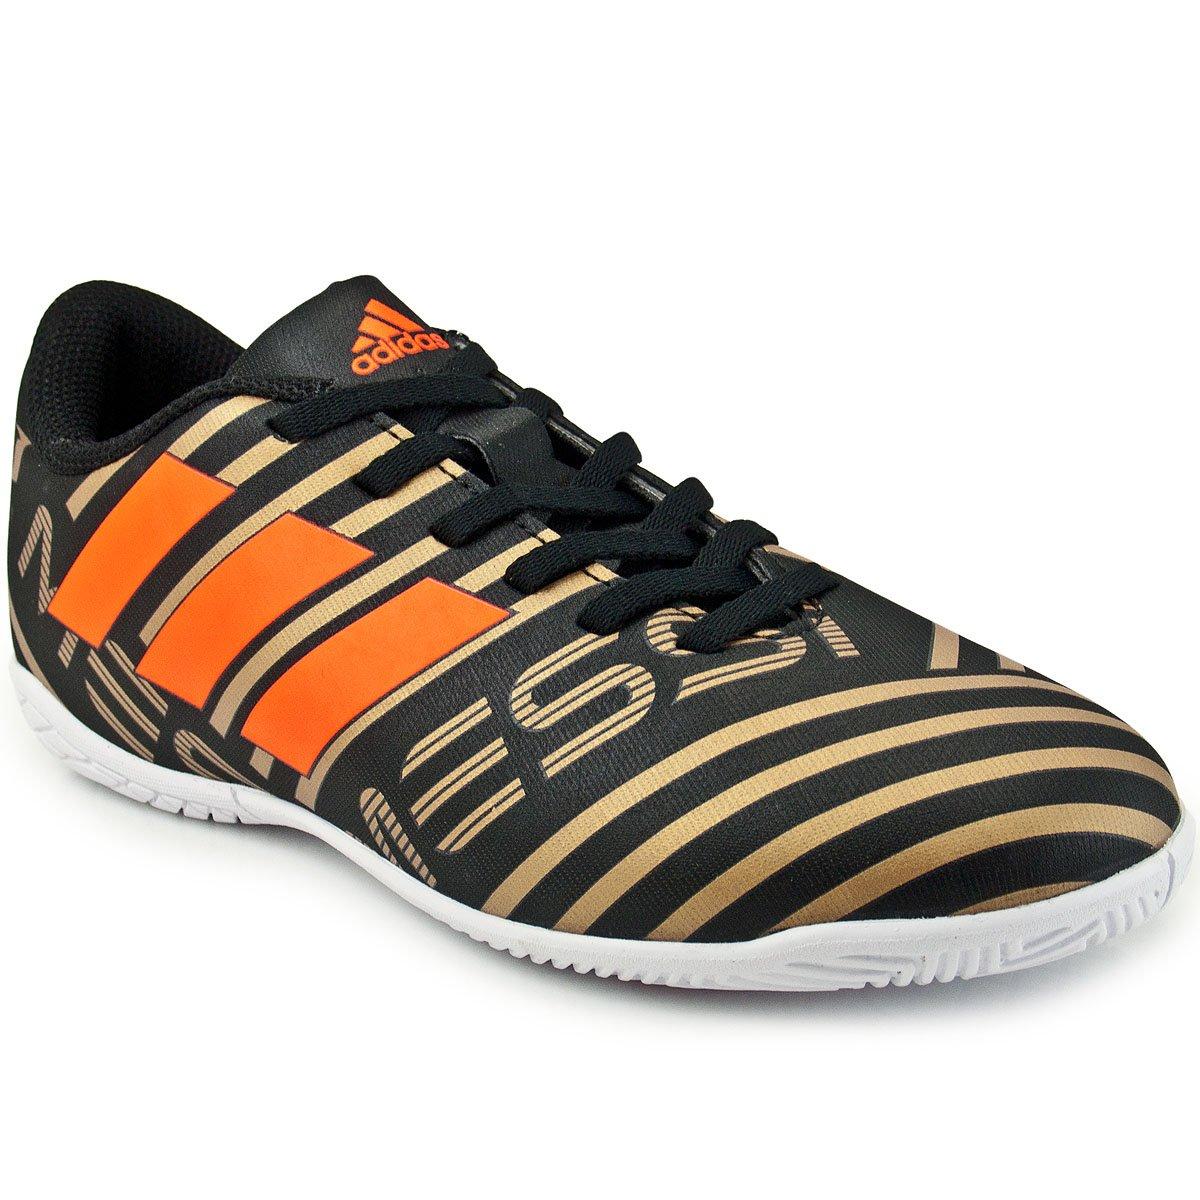 75ab37bfa5 Chuteira Adidas Nemeziz Messi Tango 17.4 IN